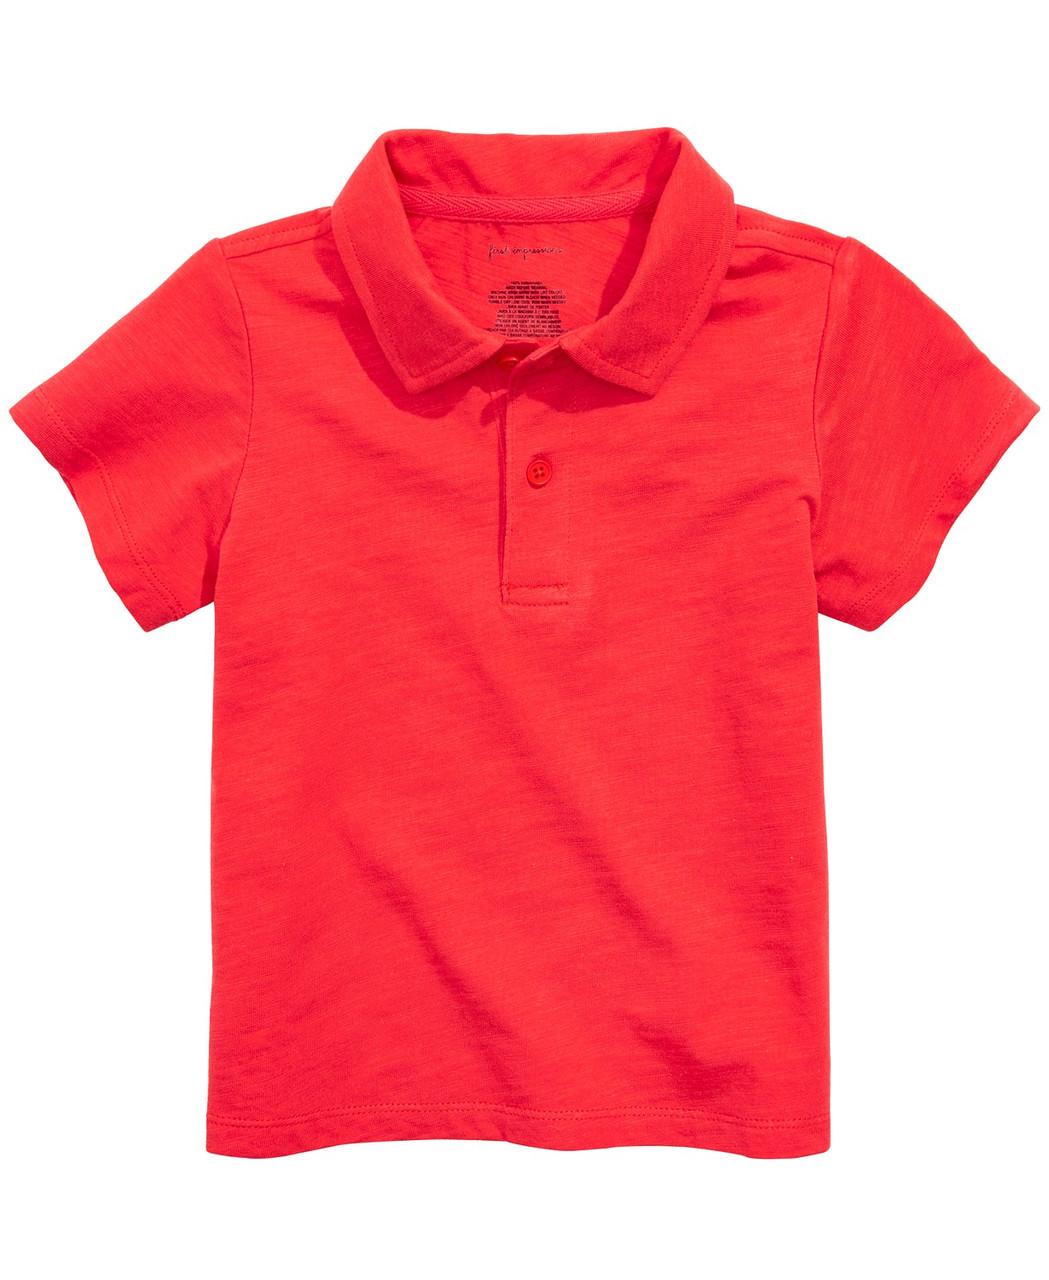 First Impressions Детская футболка-поло